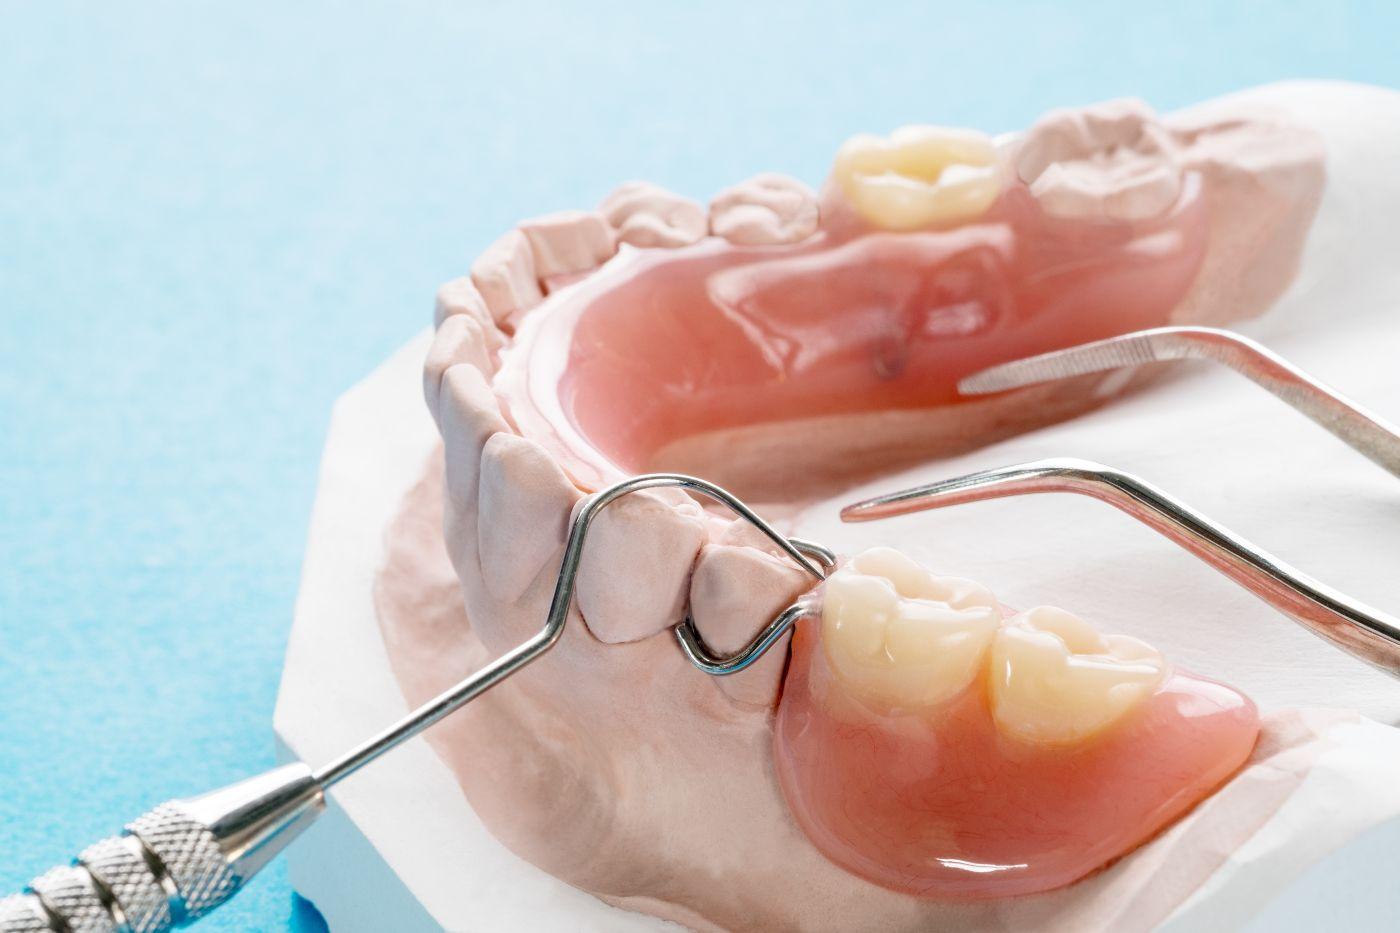 Restorative dental procedure in Spartanburg